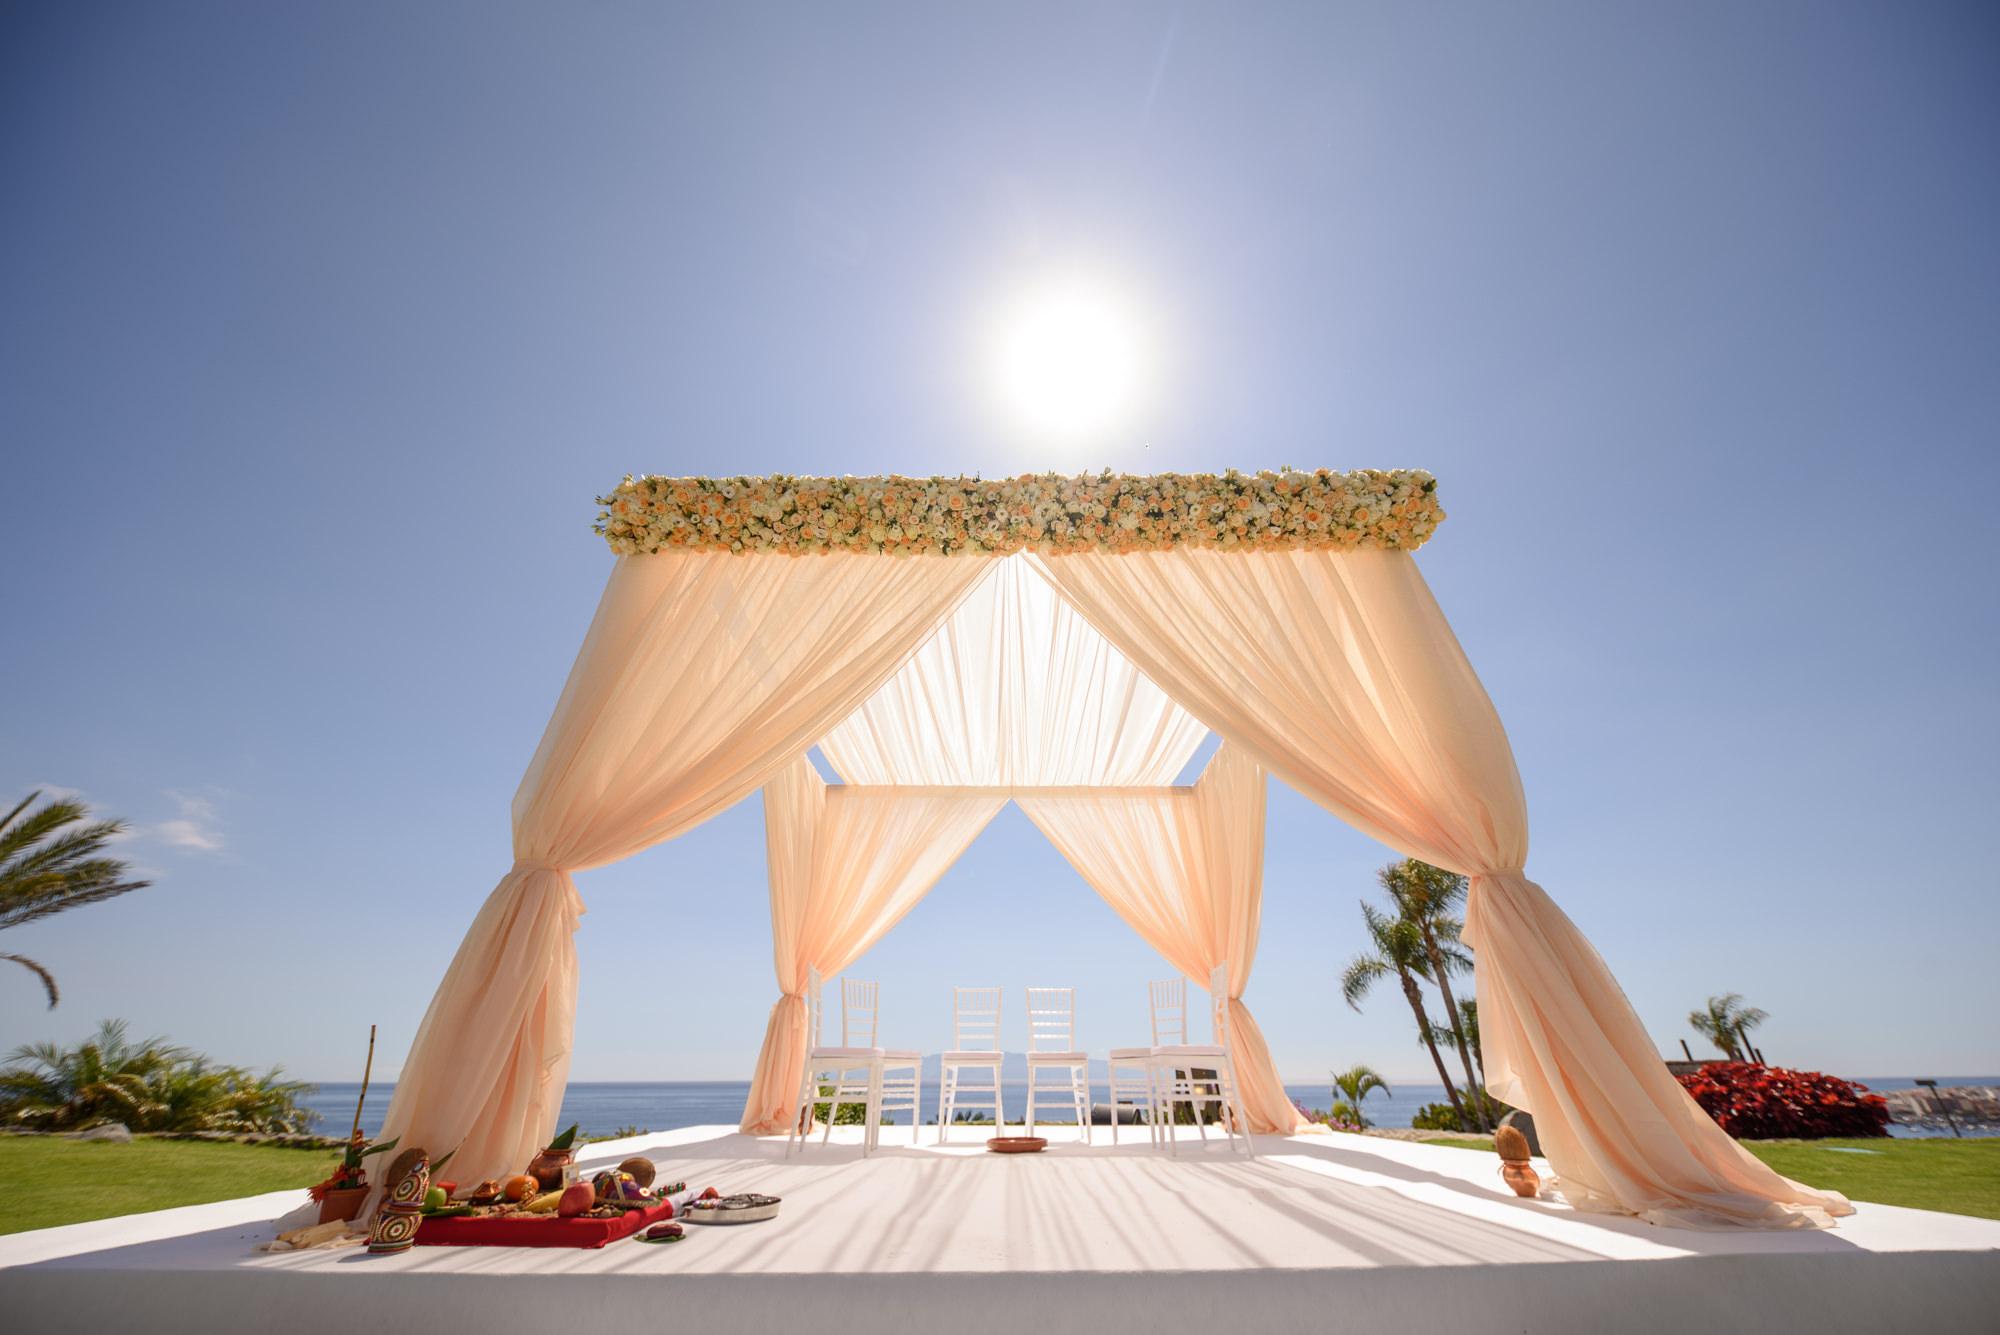 satnam photography wedding indian asian hindu destination wedding photographer tenerife ritz carlton abama-106.jpg